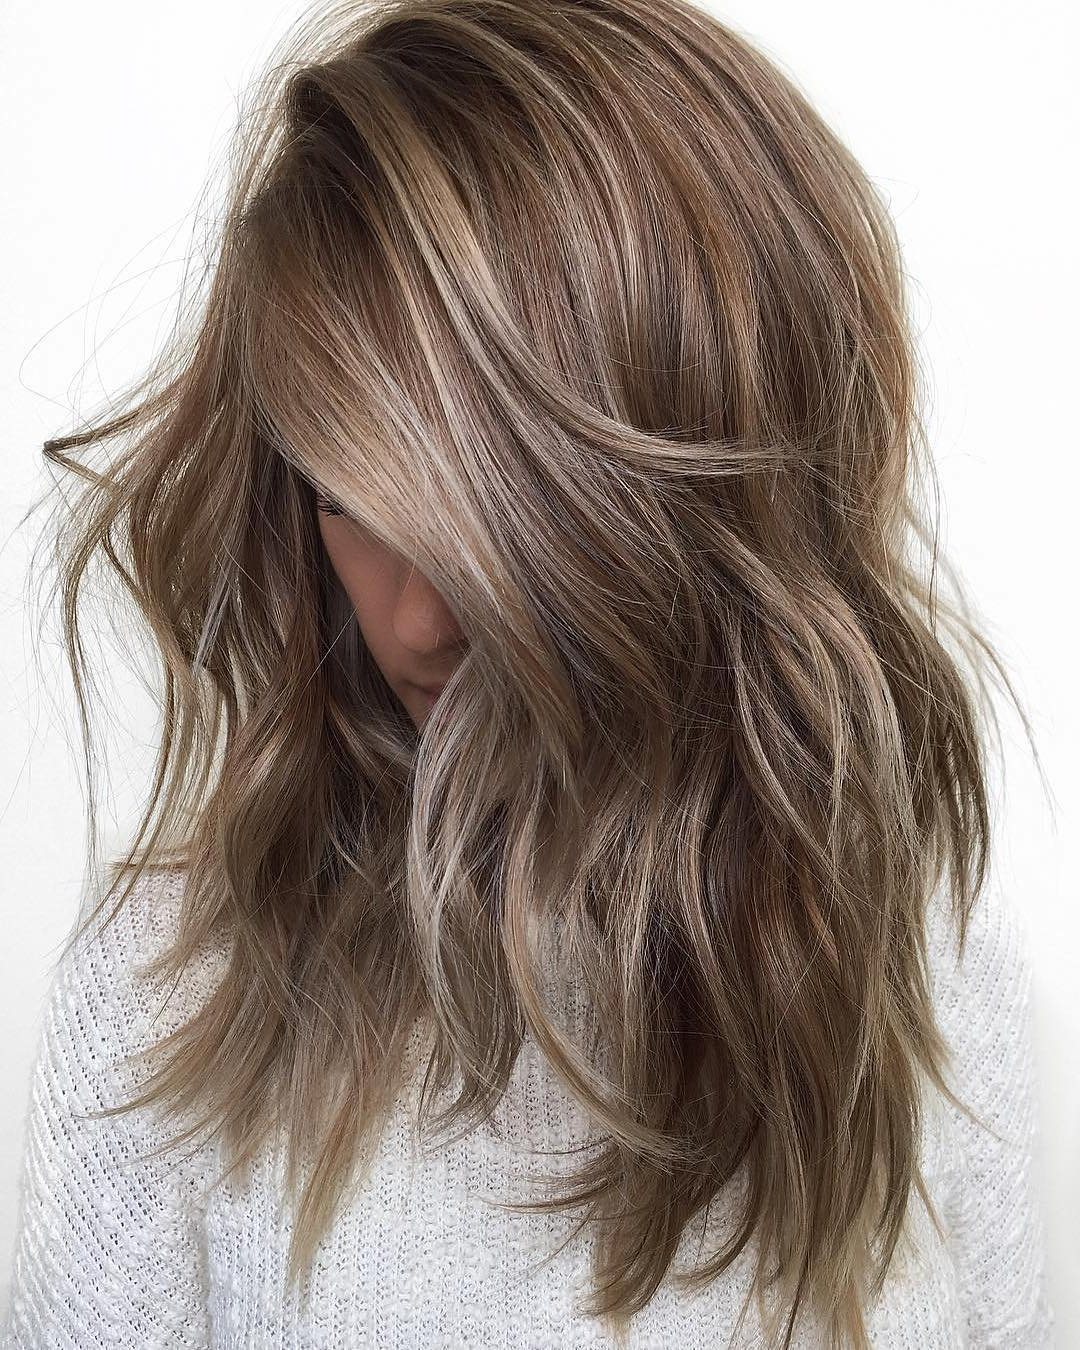 Favorite Medium Golden Bronde Shag Hairstyles With Regard To 10 Medium Length Hair Color Ideas (View 14 of 20)